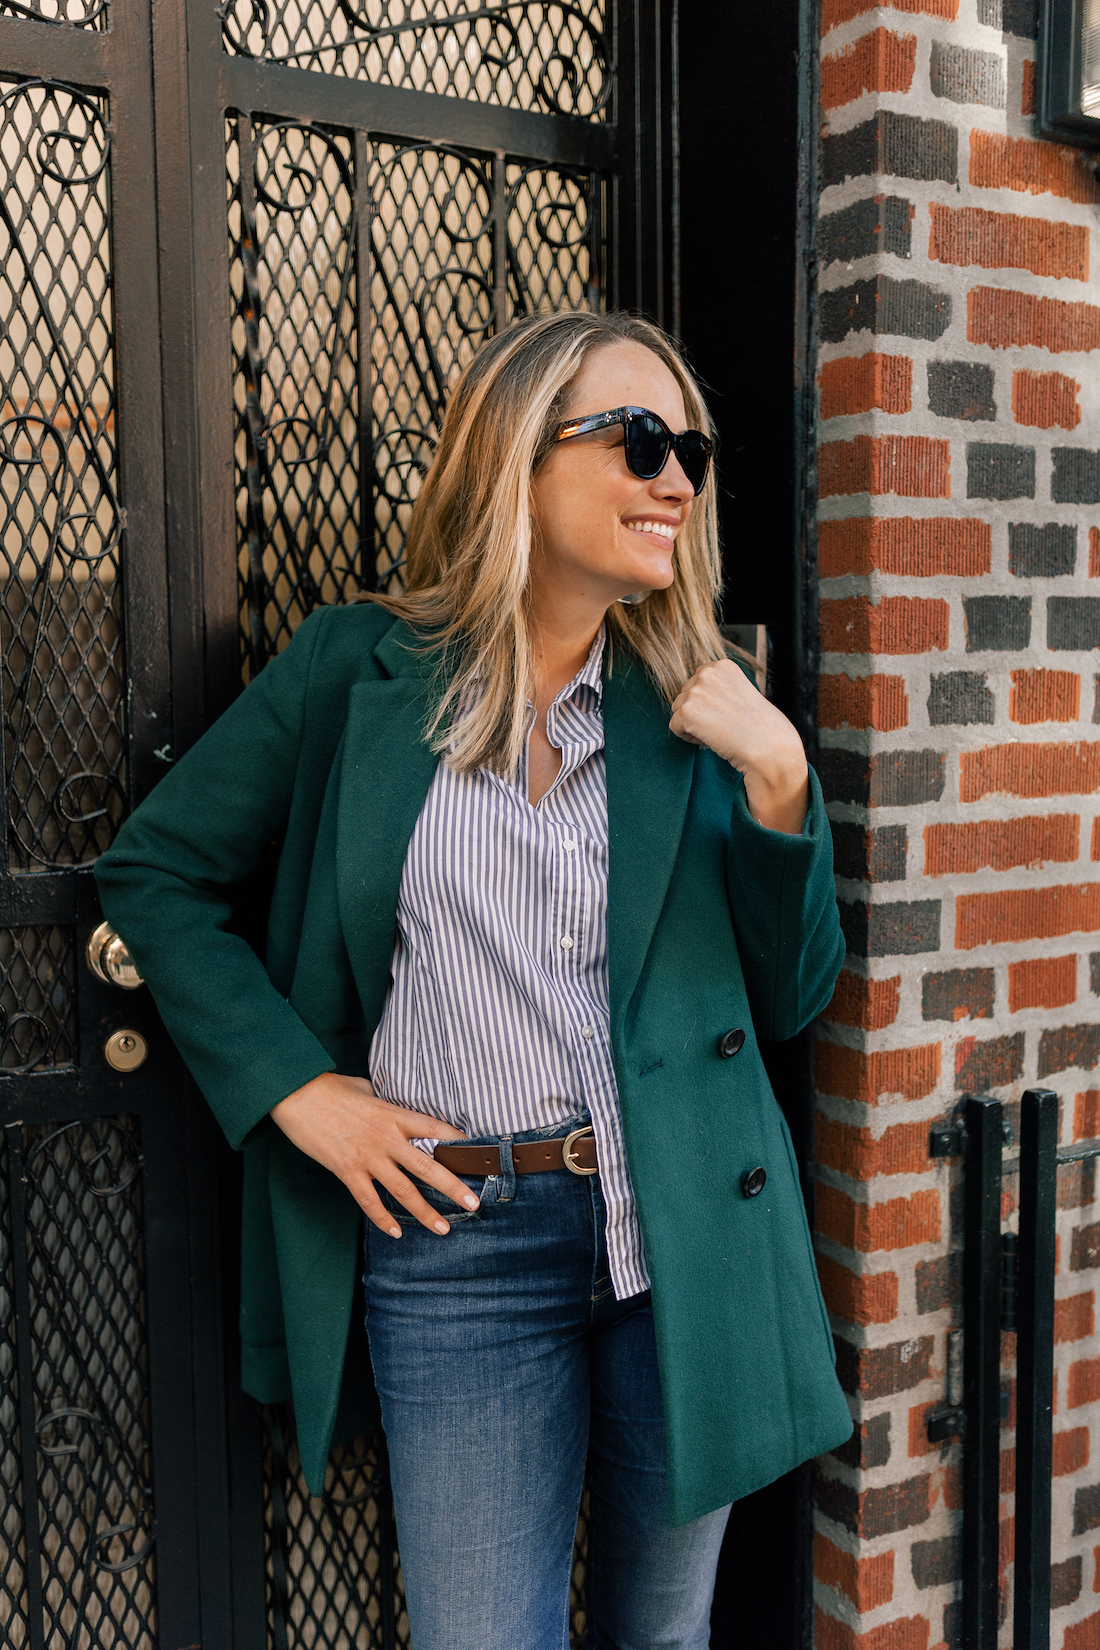 Madewell Coat// Frank & Eileen Classic Button Down Shirt // Good American Jeans // Polaroid Sunglasses // J.Crew Belt // Gucci Bag